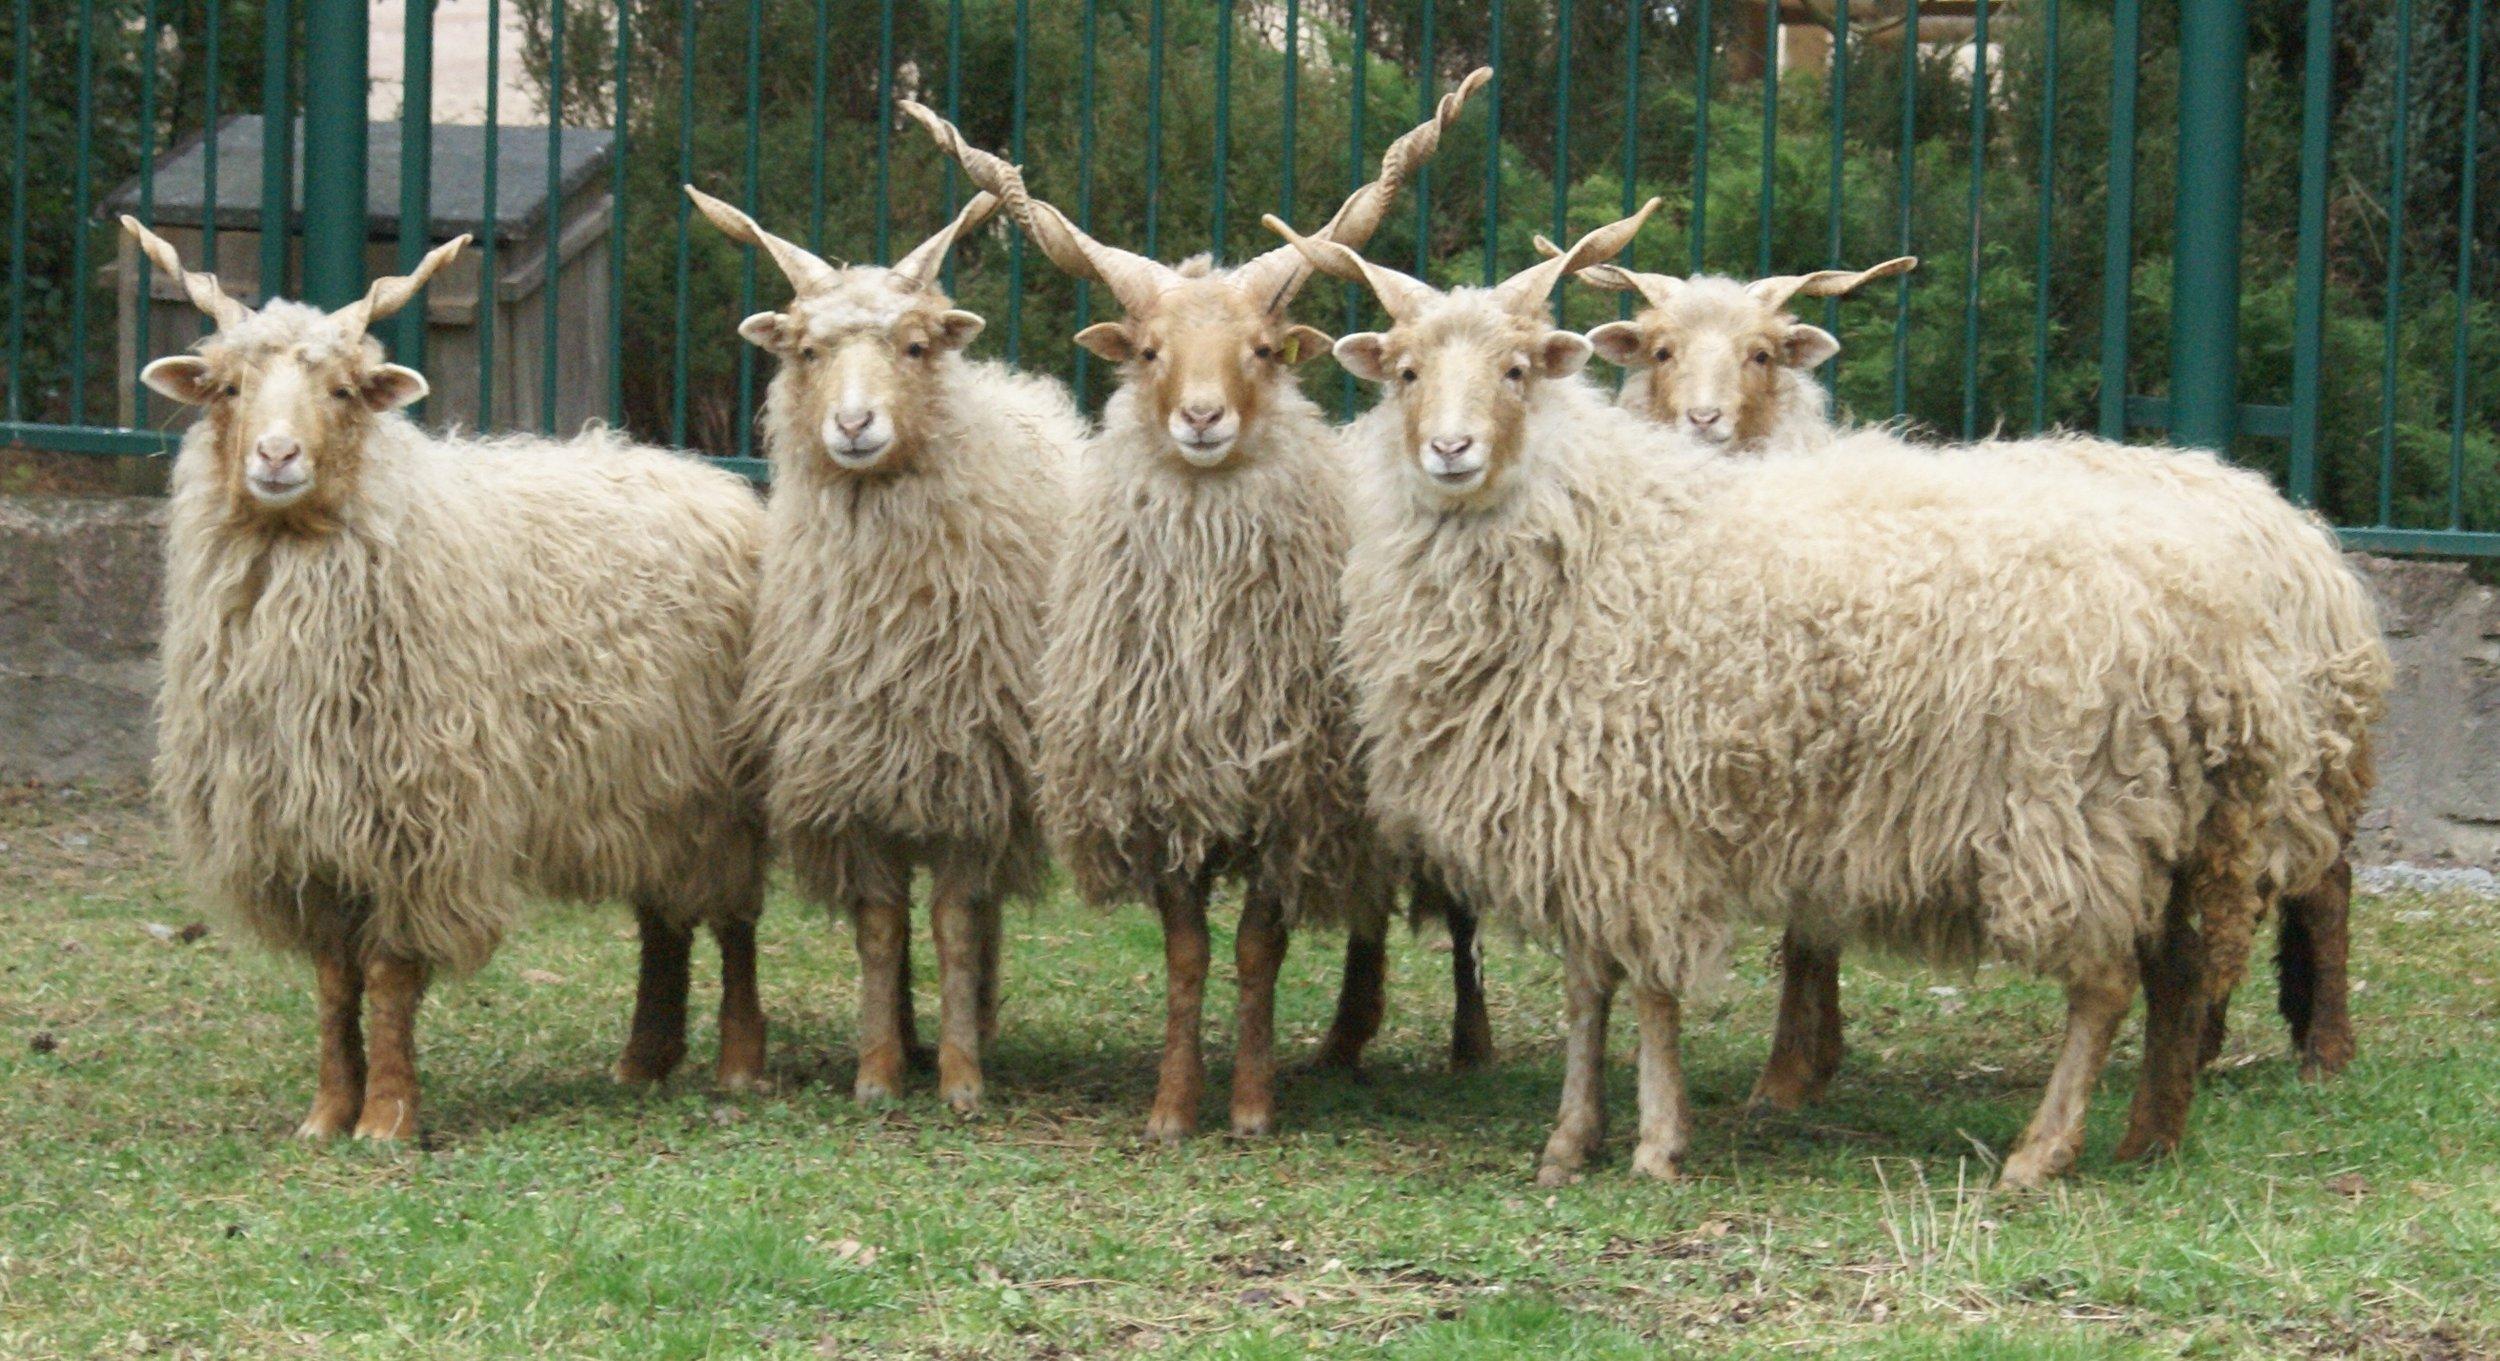 Racka Sheep, image courtesy of Wikimedia Commons